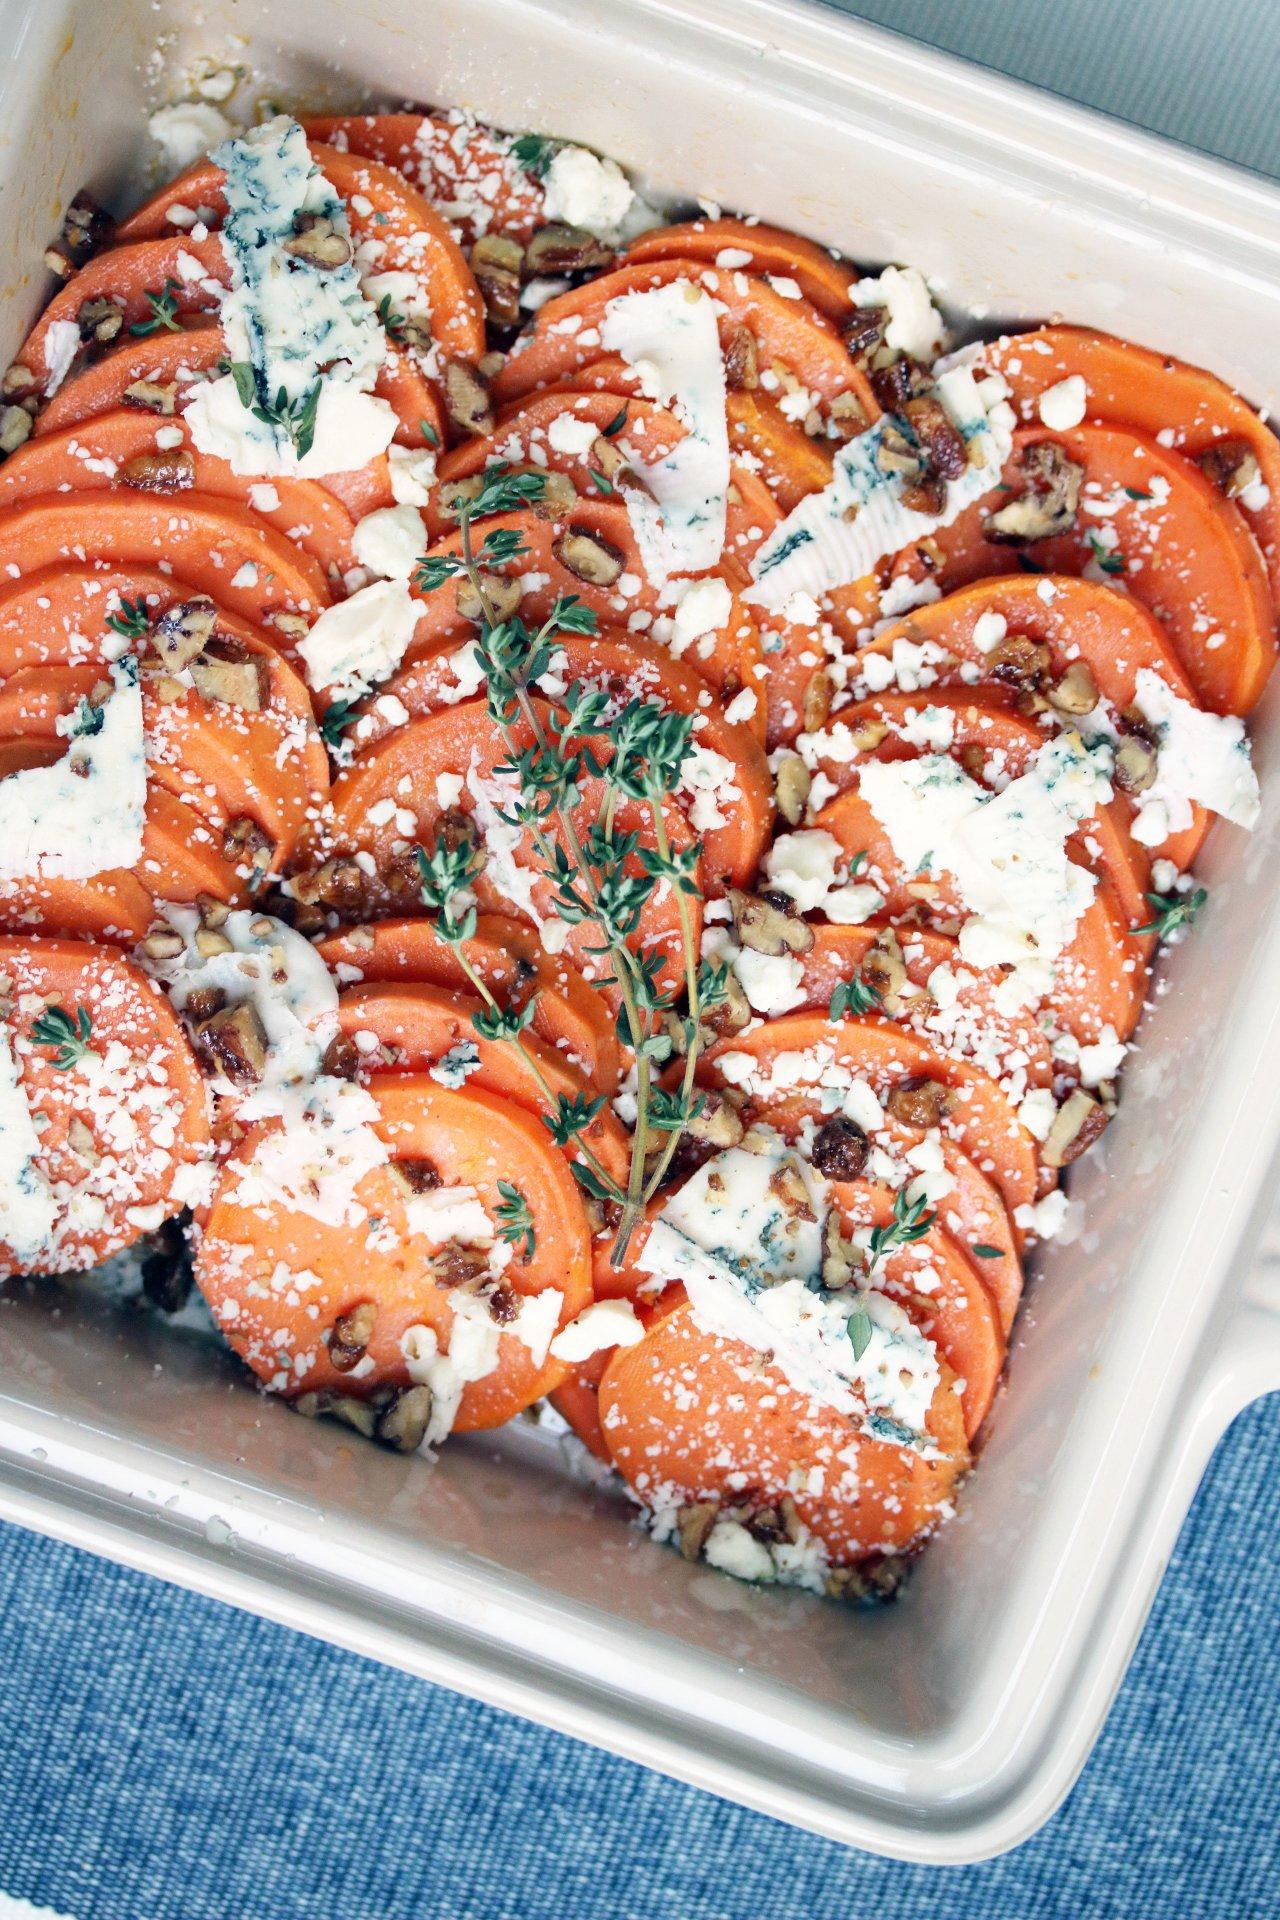 6125c622bd42df42_brandi-milloy-sweet-potatoes.jpg